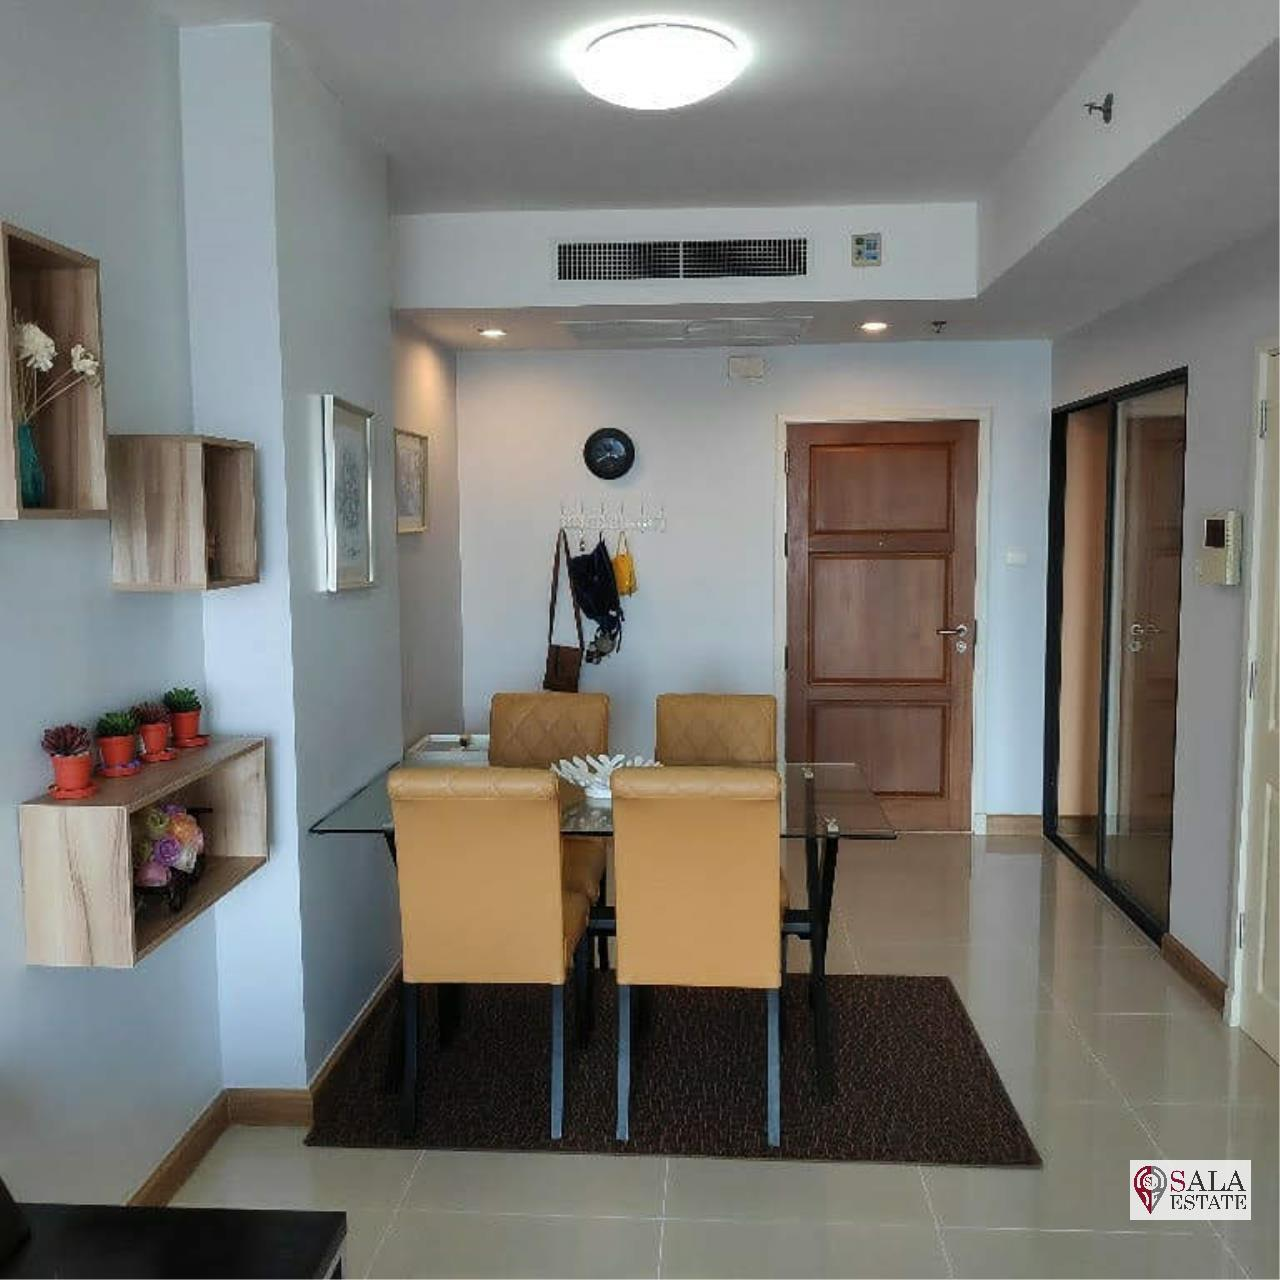 SALA ESTATE Agency's SUPALAI PREMIER NARATHIWAS – BTS CHONG NONSI, 1 BEDROOM 1 BATHROOM, FULLY FERNISHED, CITY VIEW 9